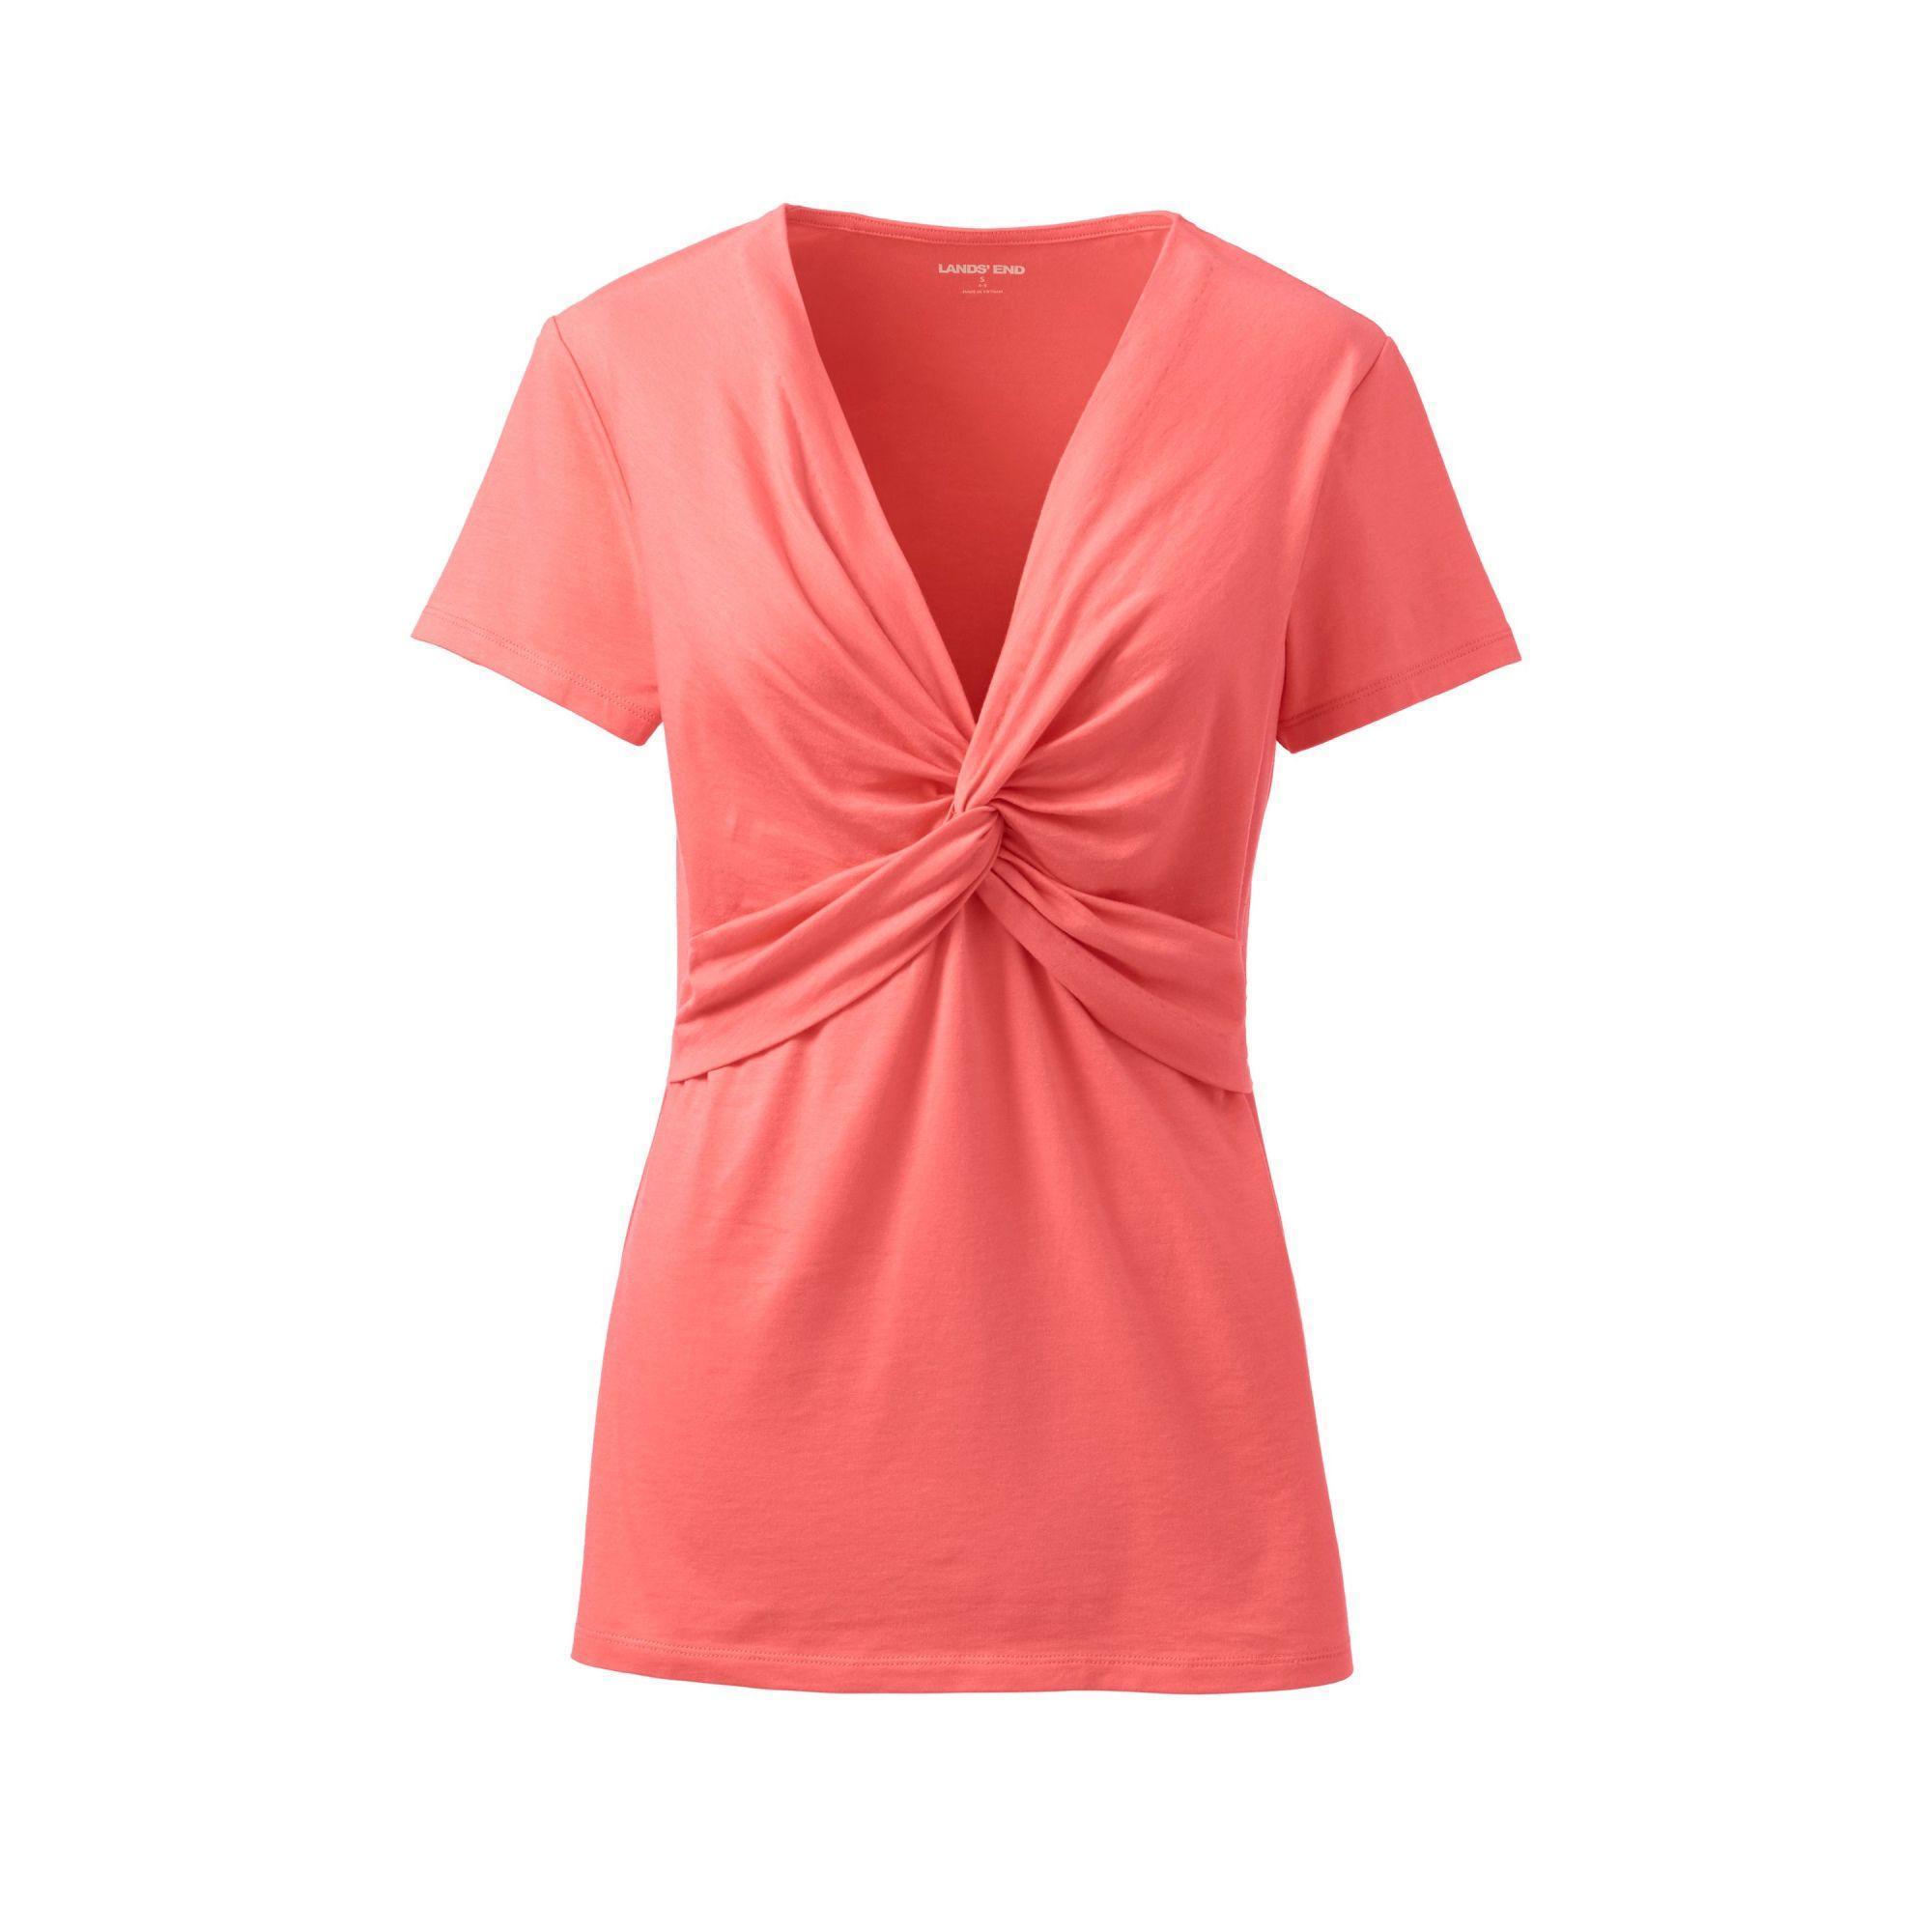 61978fa328a Lands' End. Women's Orange Petite Lightweight Cotton-modal Knot Front T- shirt